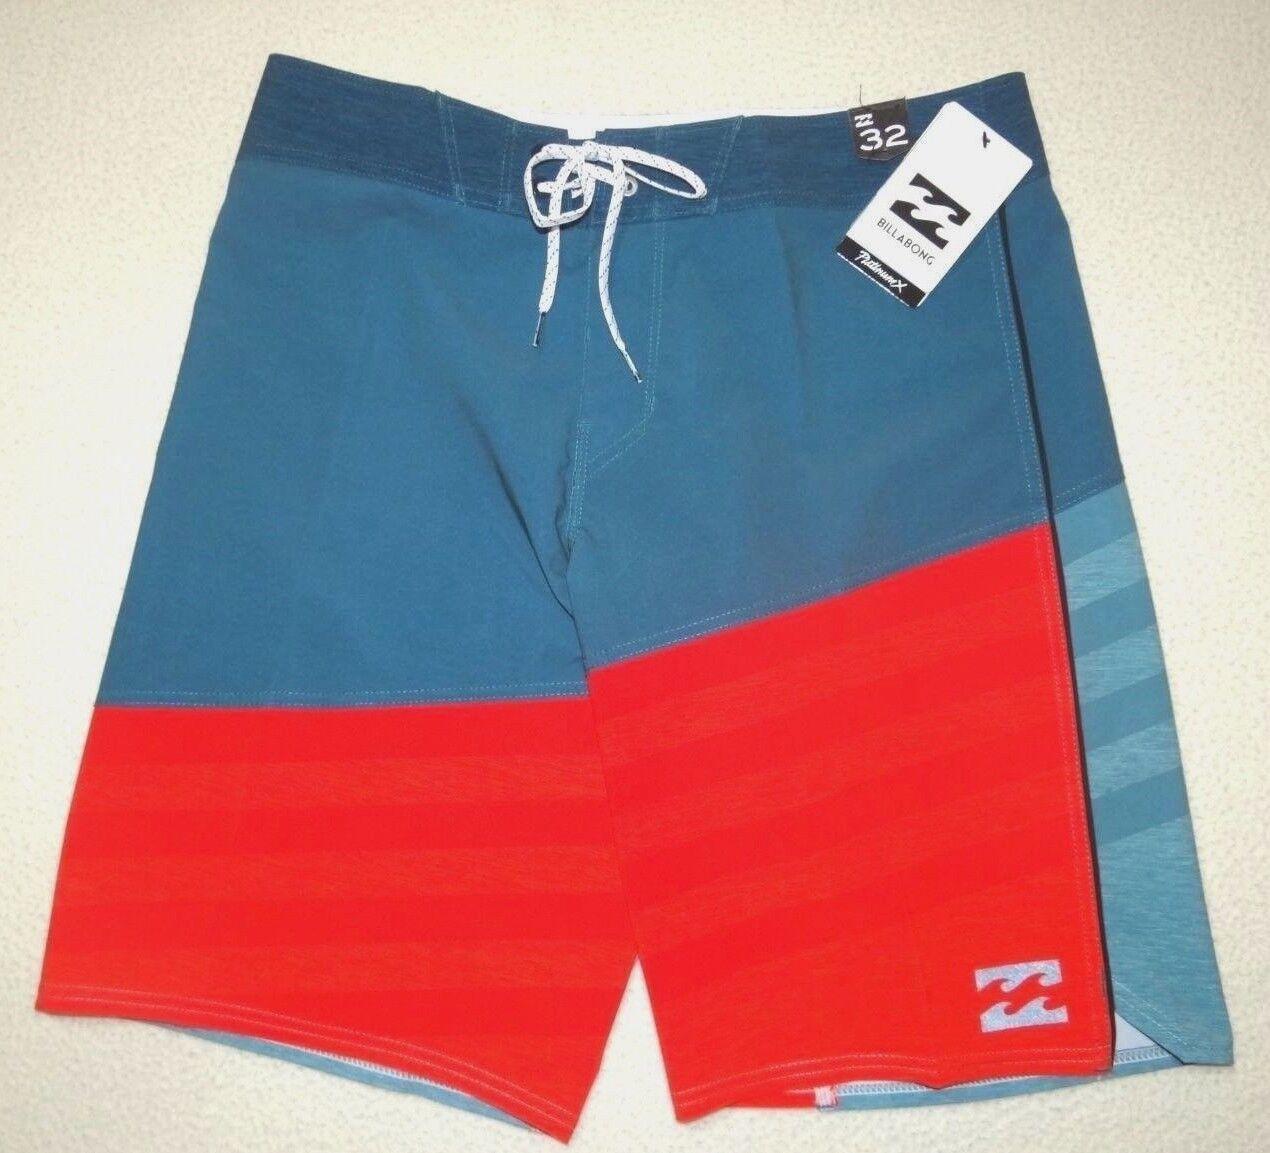 New Billabong Mens Slice A Frame Platinum X 20  Surf Swim Shorts Boardshorts 32